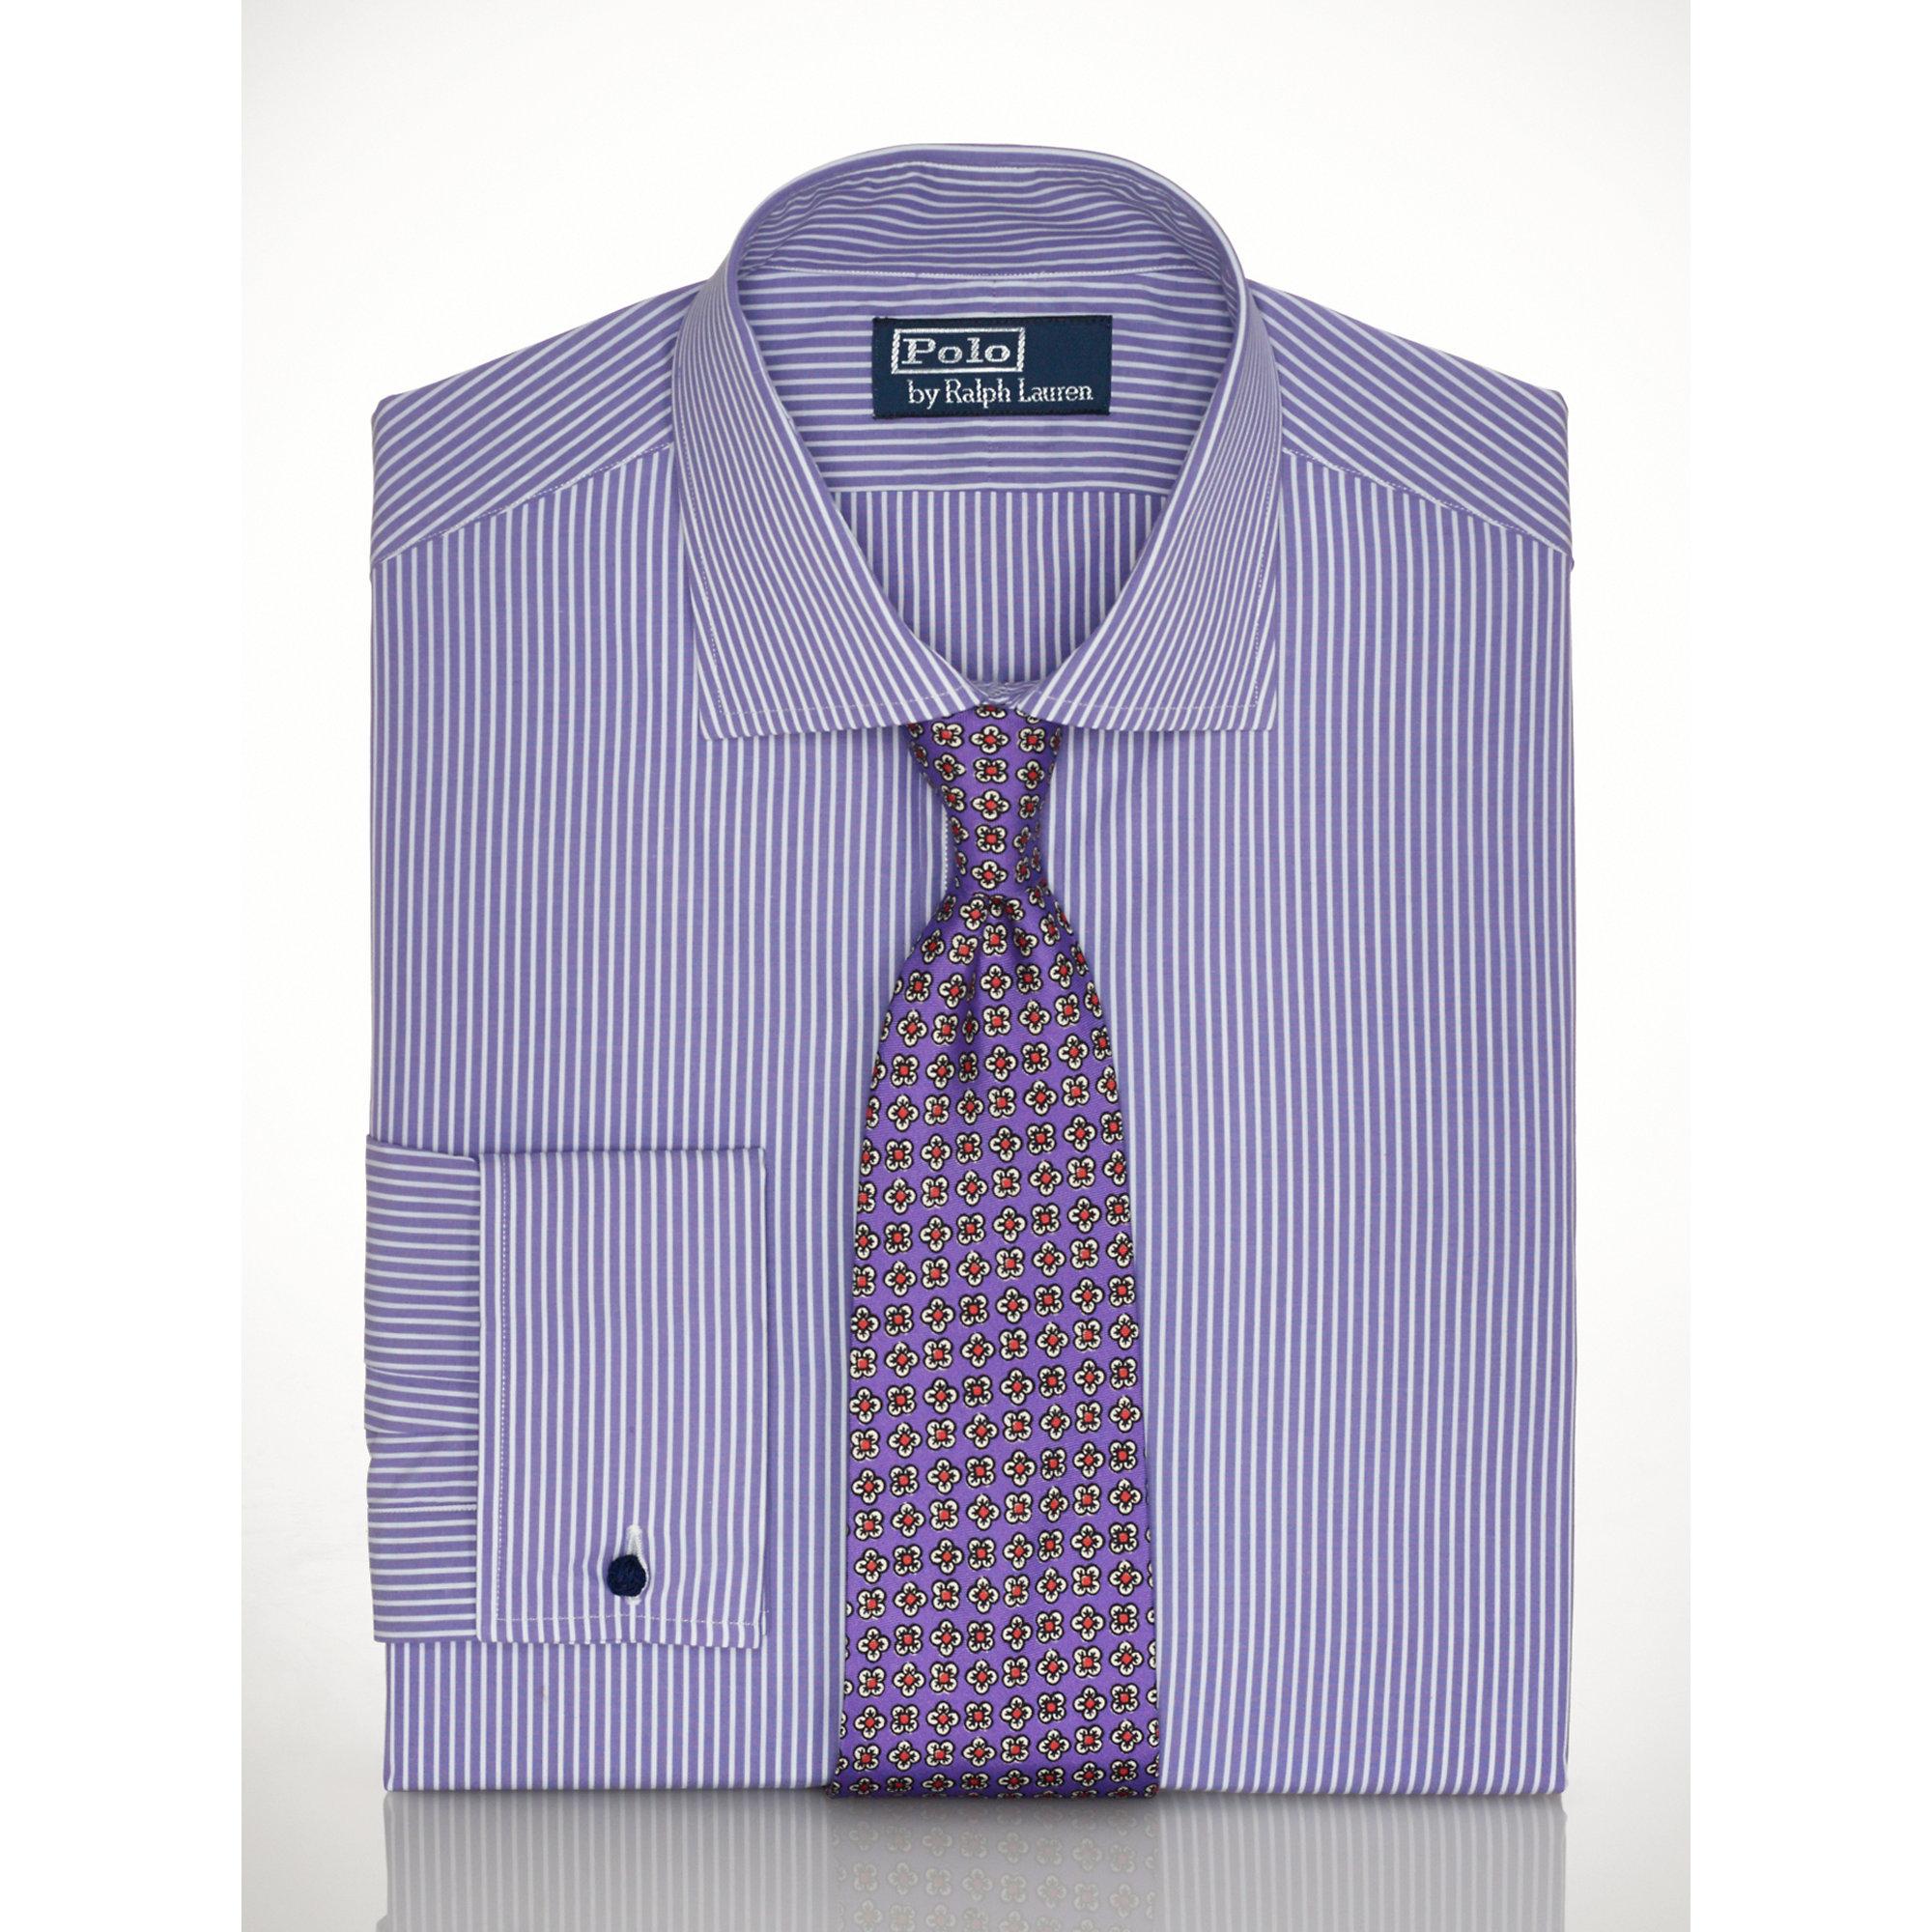 Polo ralph lauren purple custom fit regent dress shirt for Custom fit dress shirts